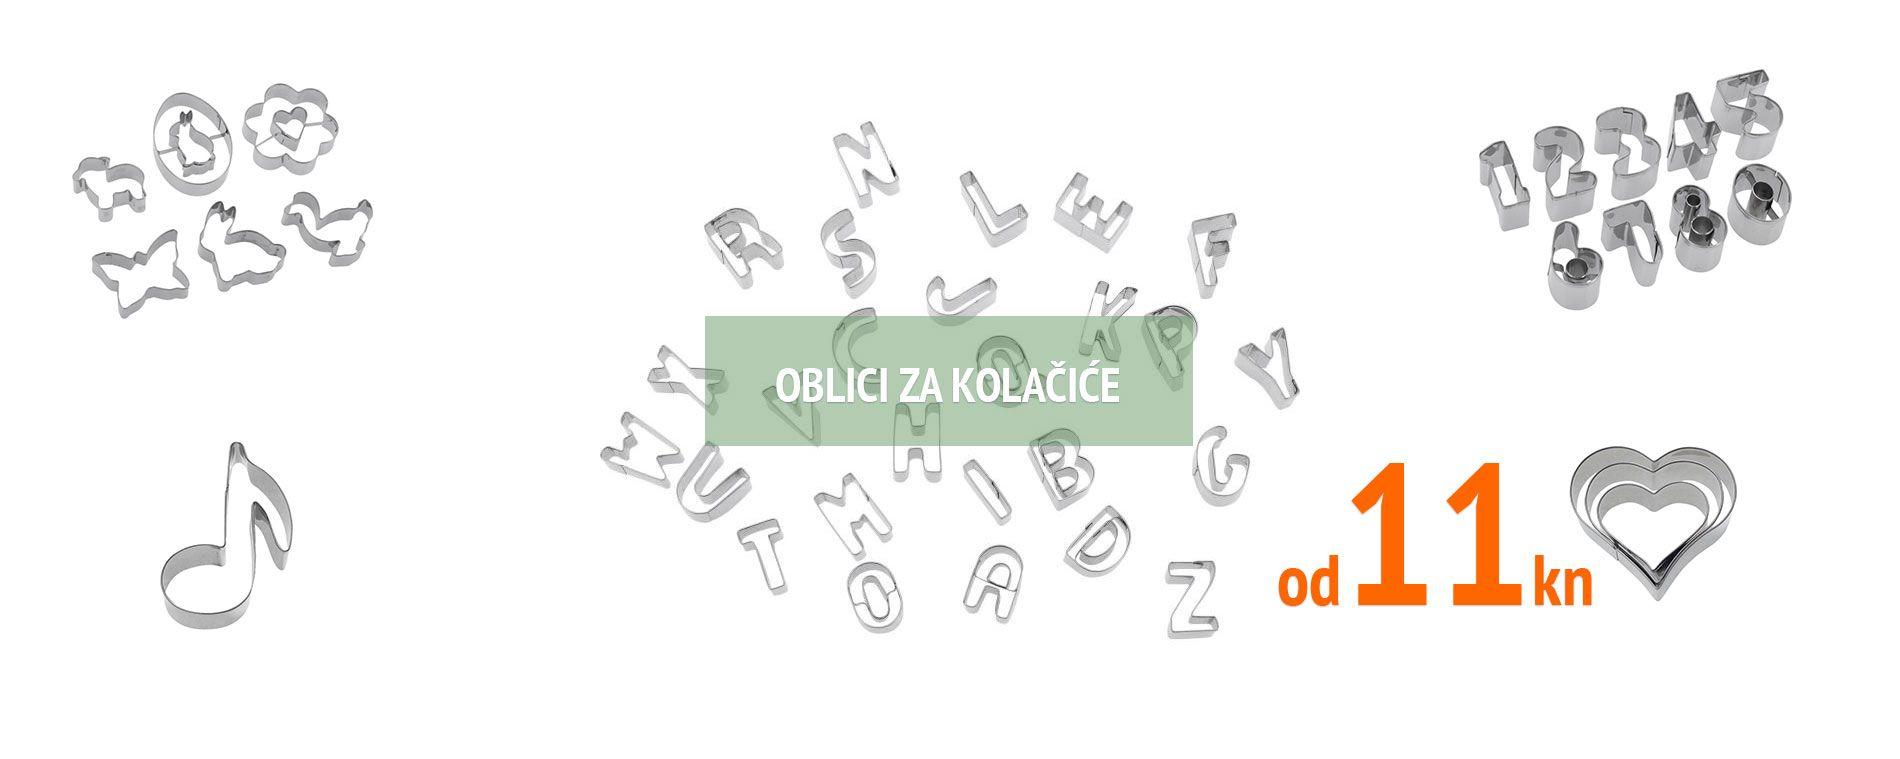 http://www.kuhinja.net/kuhati/kolaci/oblici-za-kolacice#product_list_order=price